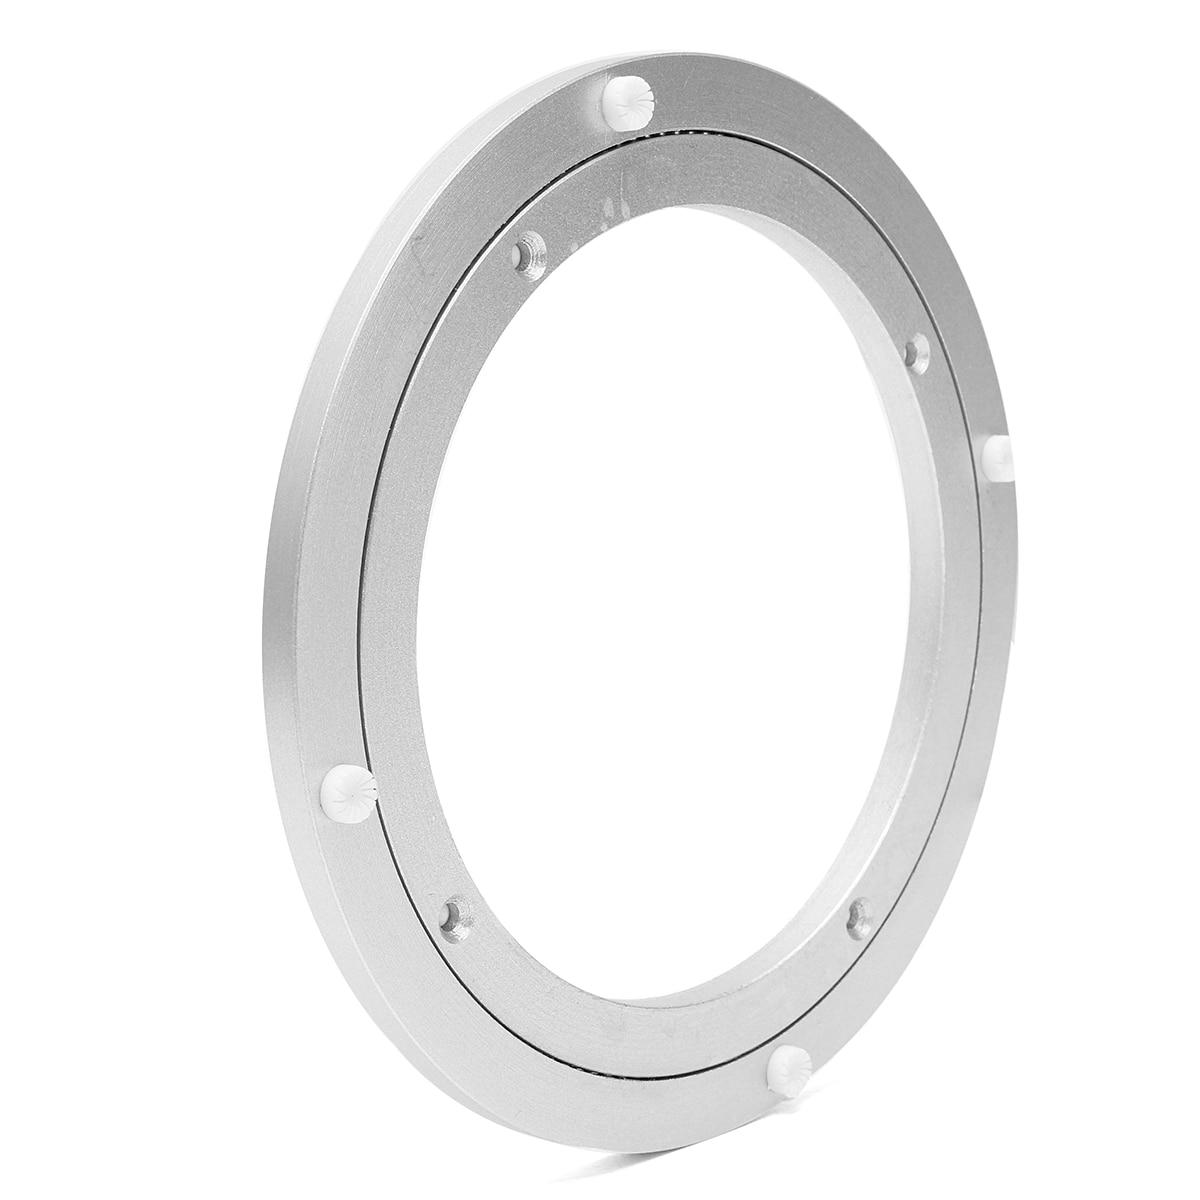 Aluminum 200mm 8/'/' Dining-table Turntable Bearings Swivel Home Hardware Loads